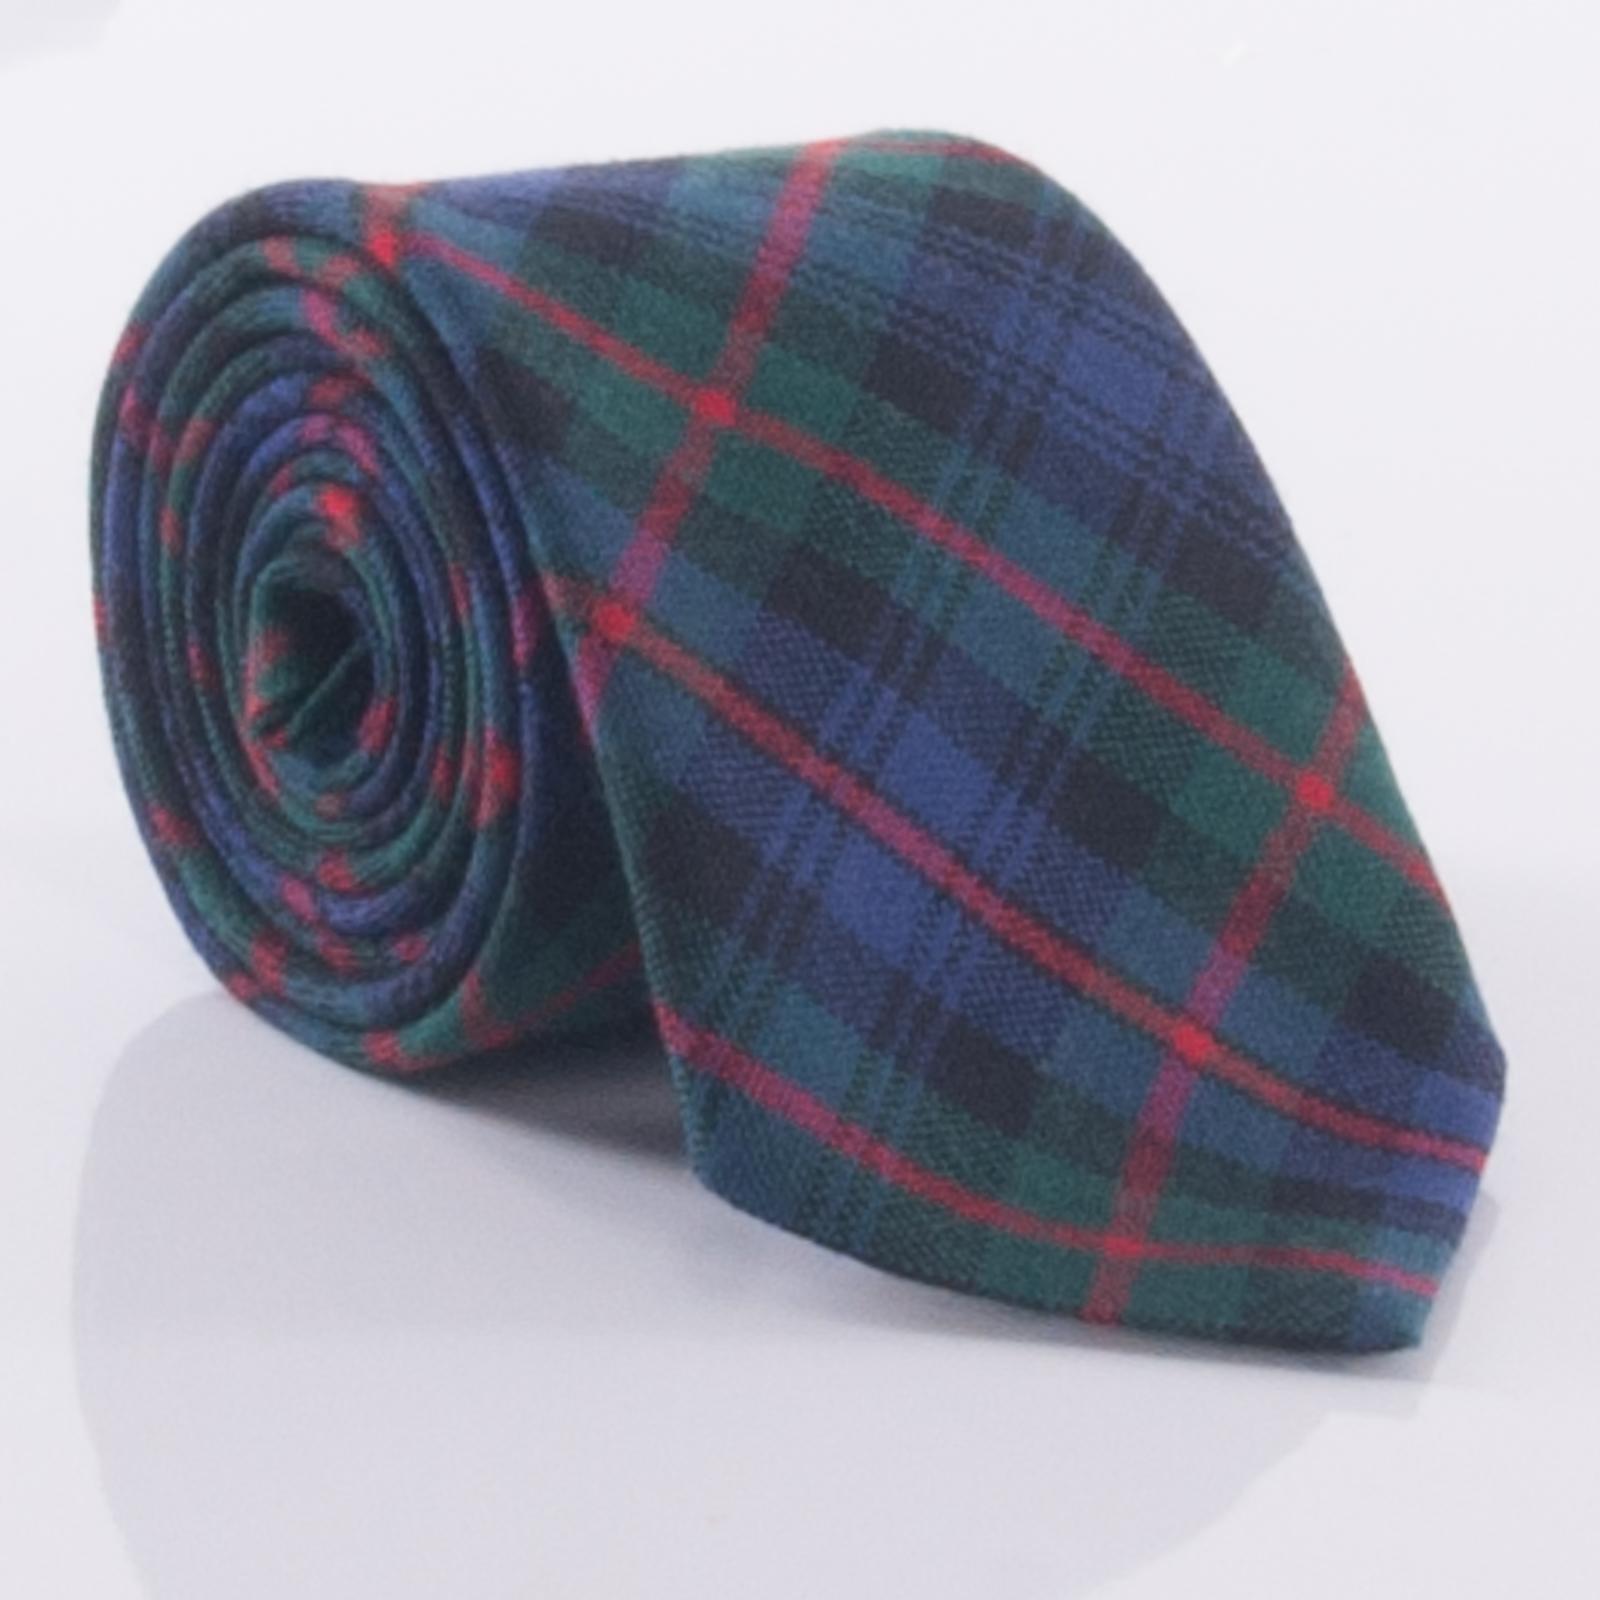 Mens Bow Tie Woven in Scotland Murray of Atholl Modern Tartan